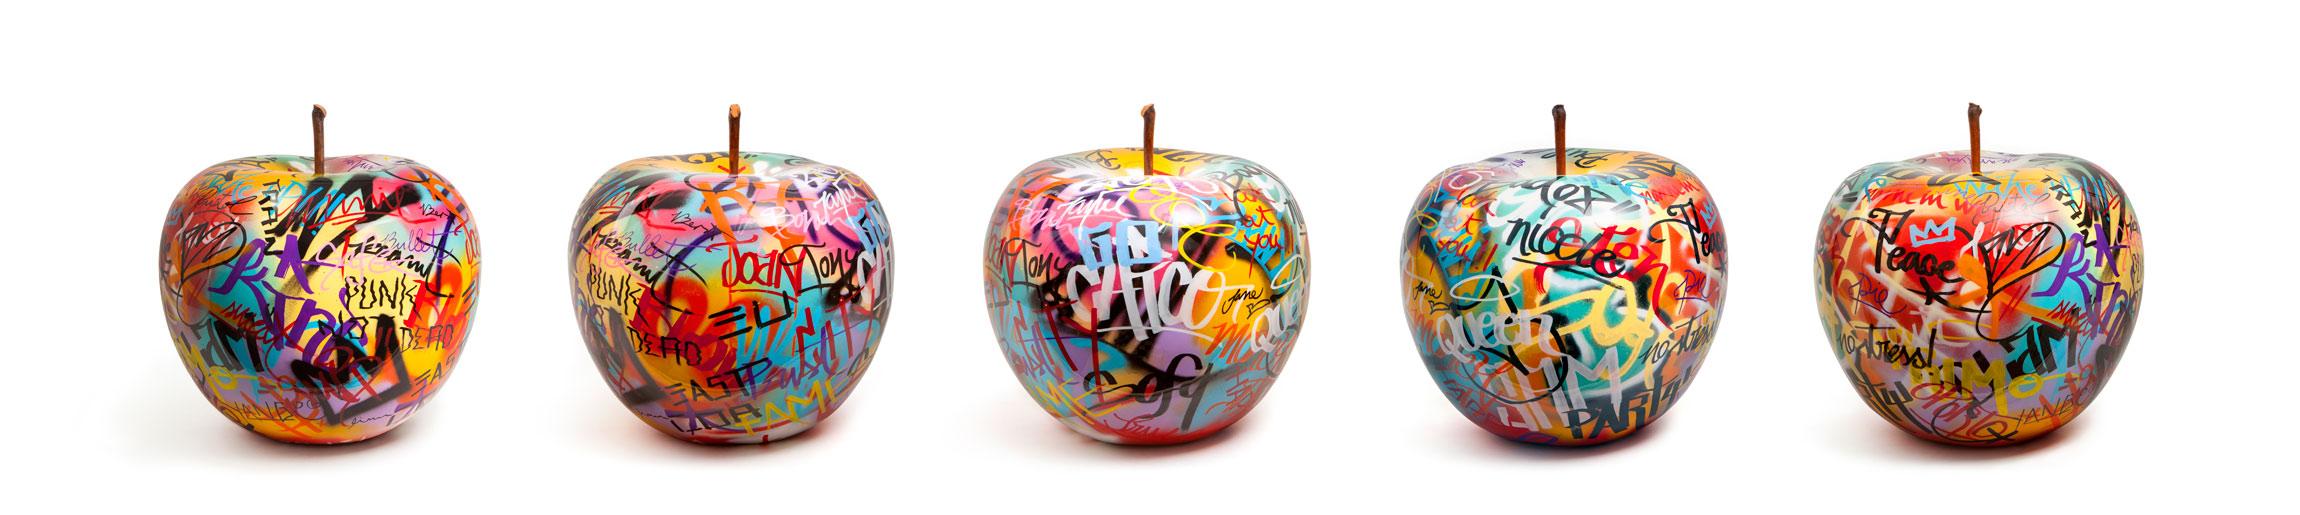 BS_2015_apples_bruno_www